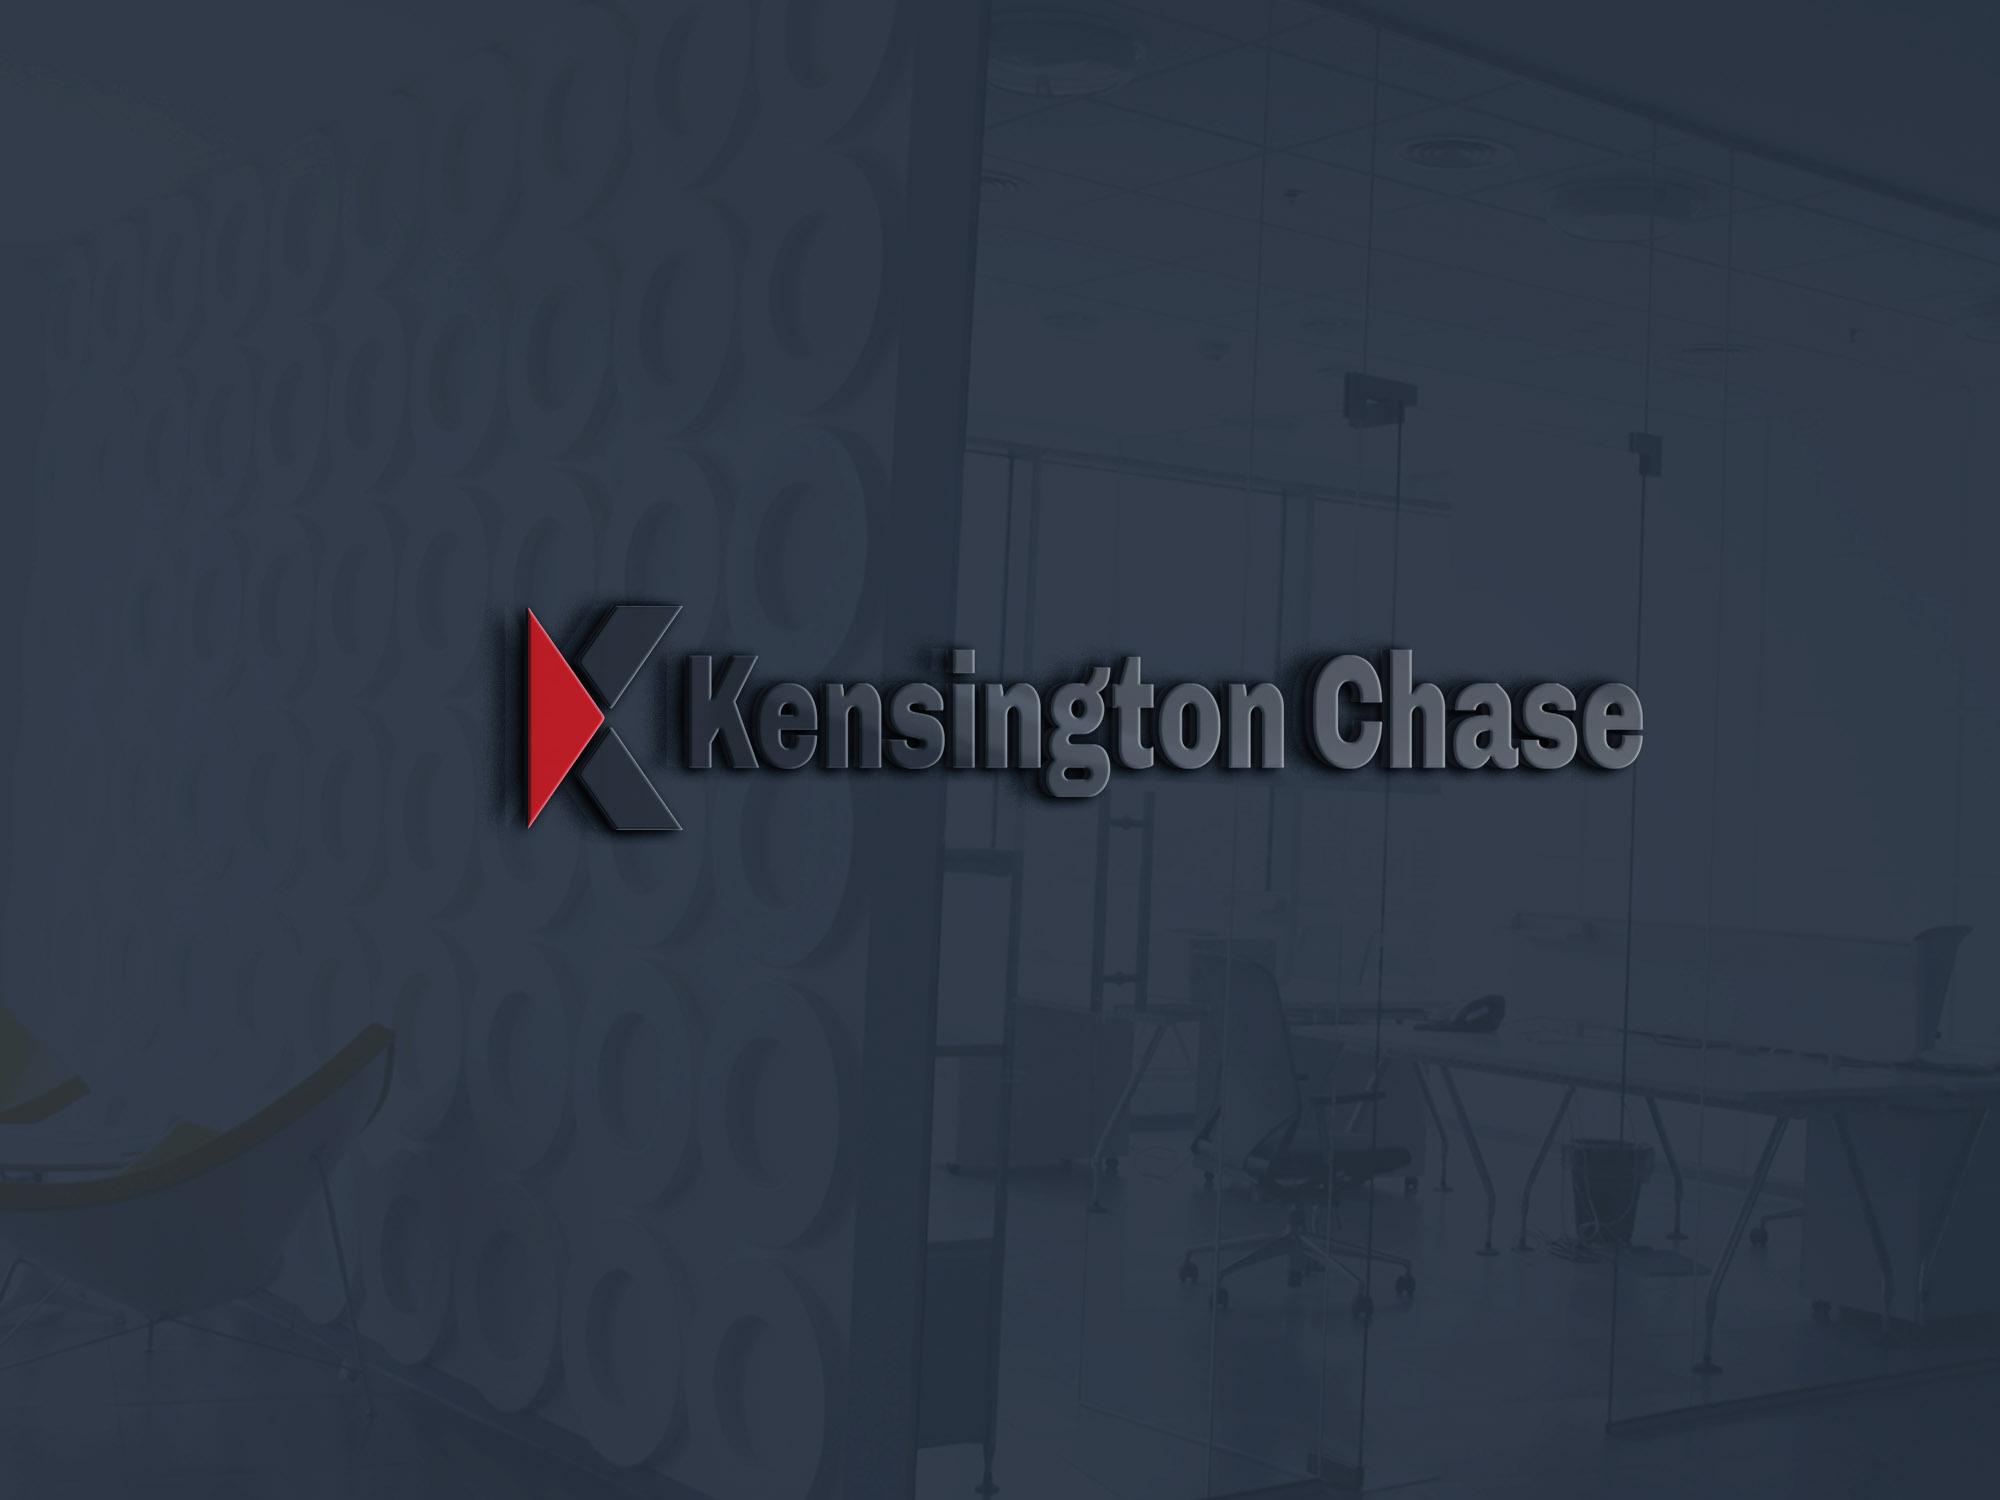 Logo Design by YANUAR ANTABUA - Entry No. 17 in the Logo Design Contest Kensington Chase  Logo Design.